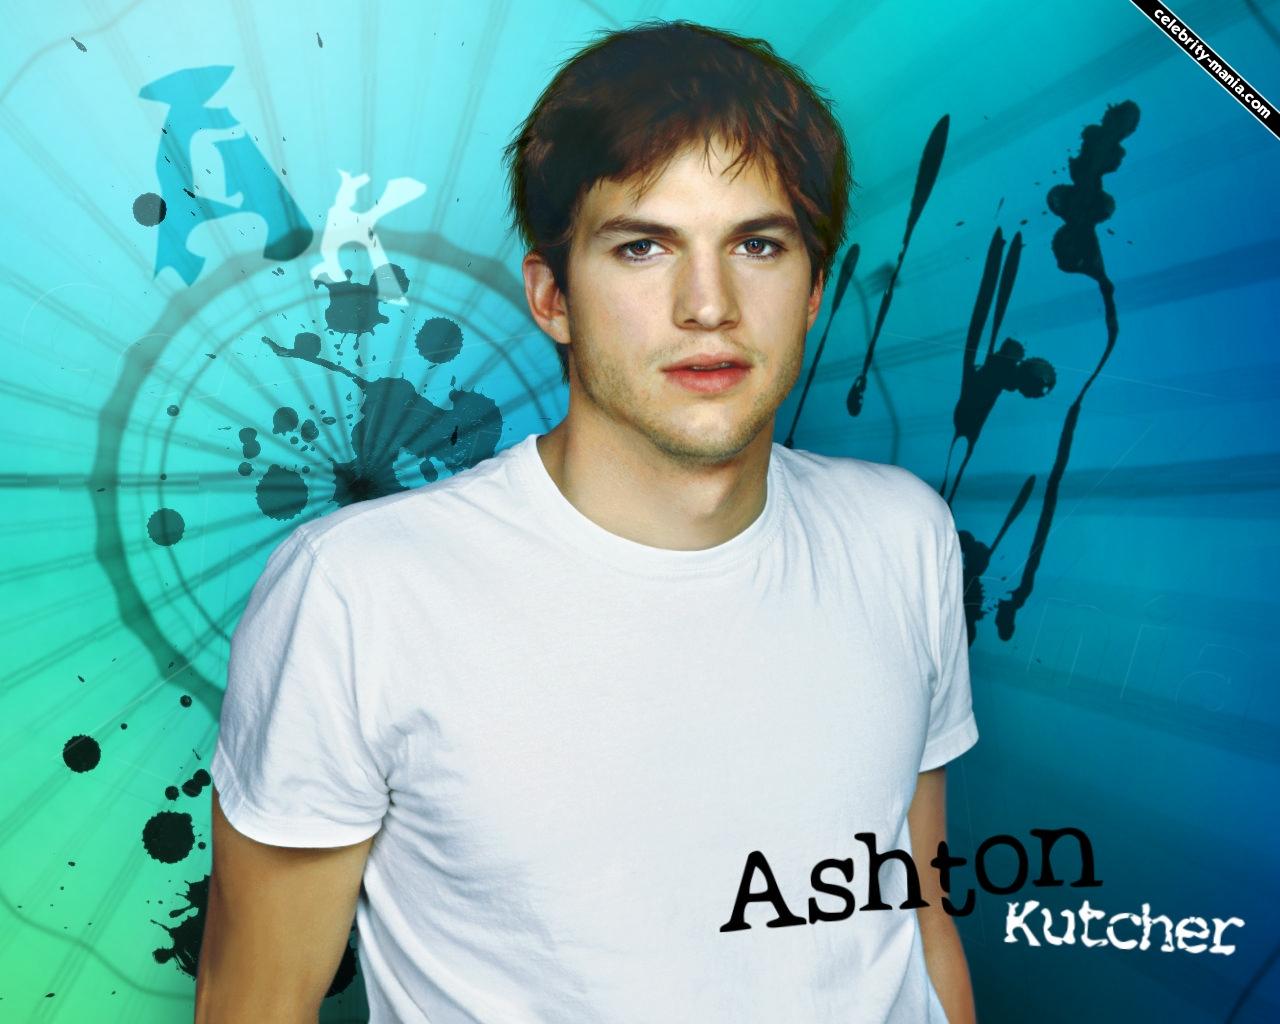 http://1.bp.blogspot.com/-dIQoMo_US9o/T6Yhy_PBSrI/AAAAAAAAXYk/HOzNSl3f1ck/s1600/wallpapers-ashton-kutcher-29.jpg